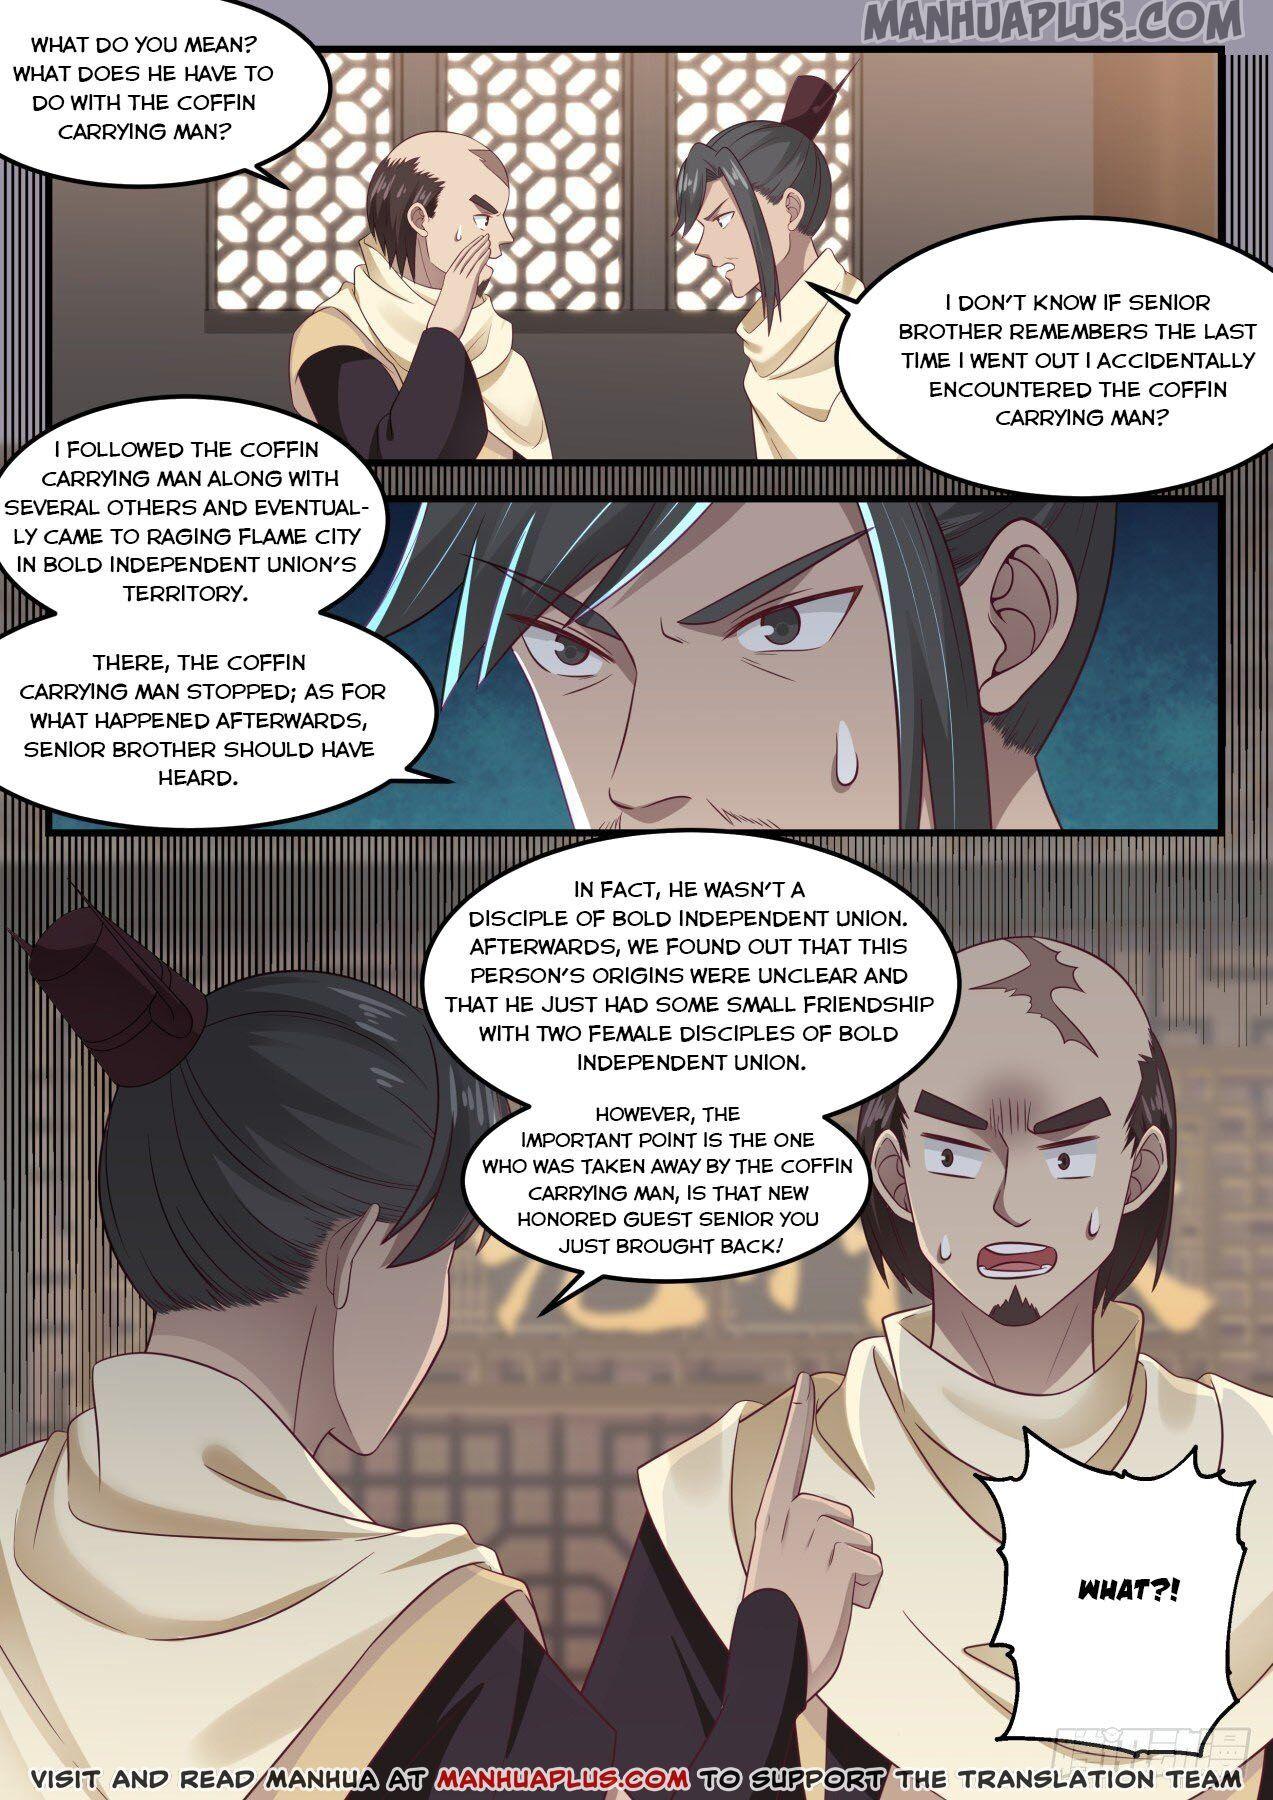 https://manga.mangadogs.com/comics/pic4/17/21329/2058508/9593a442d5efc4732b3c25e7381d4049.jpg Page 2